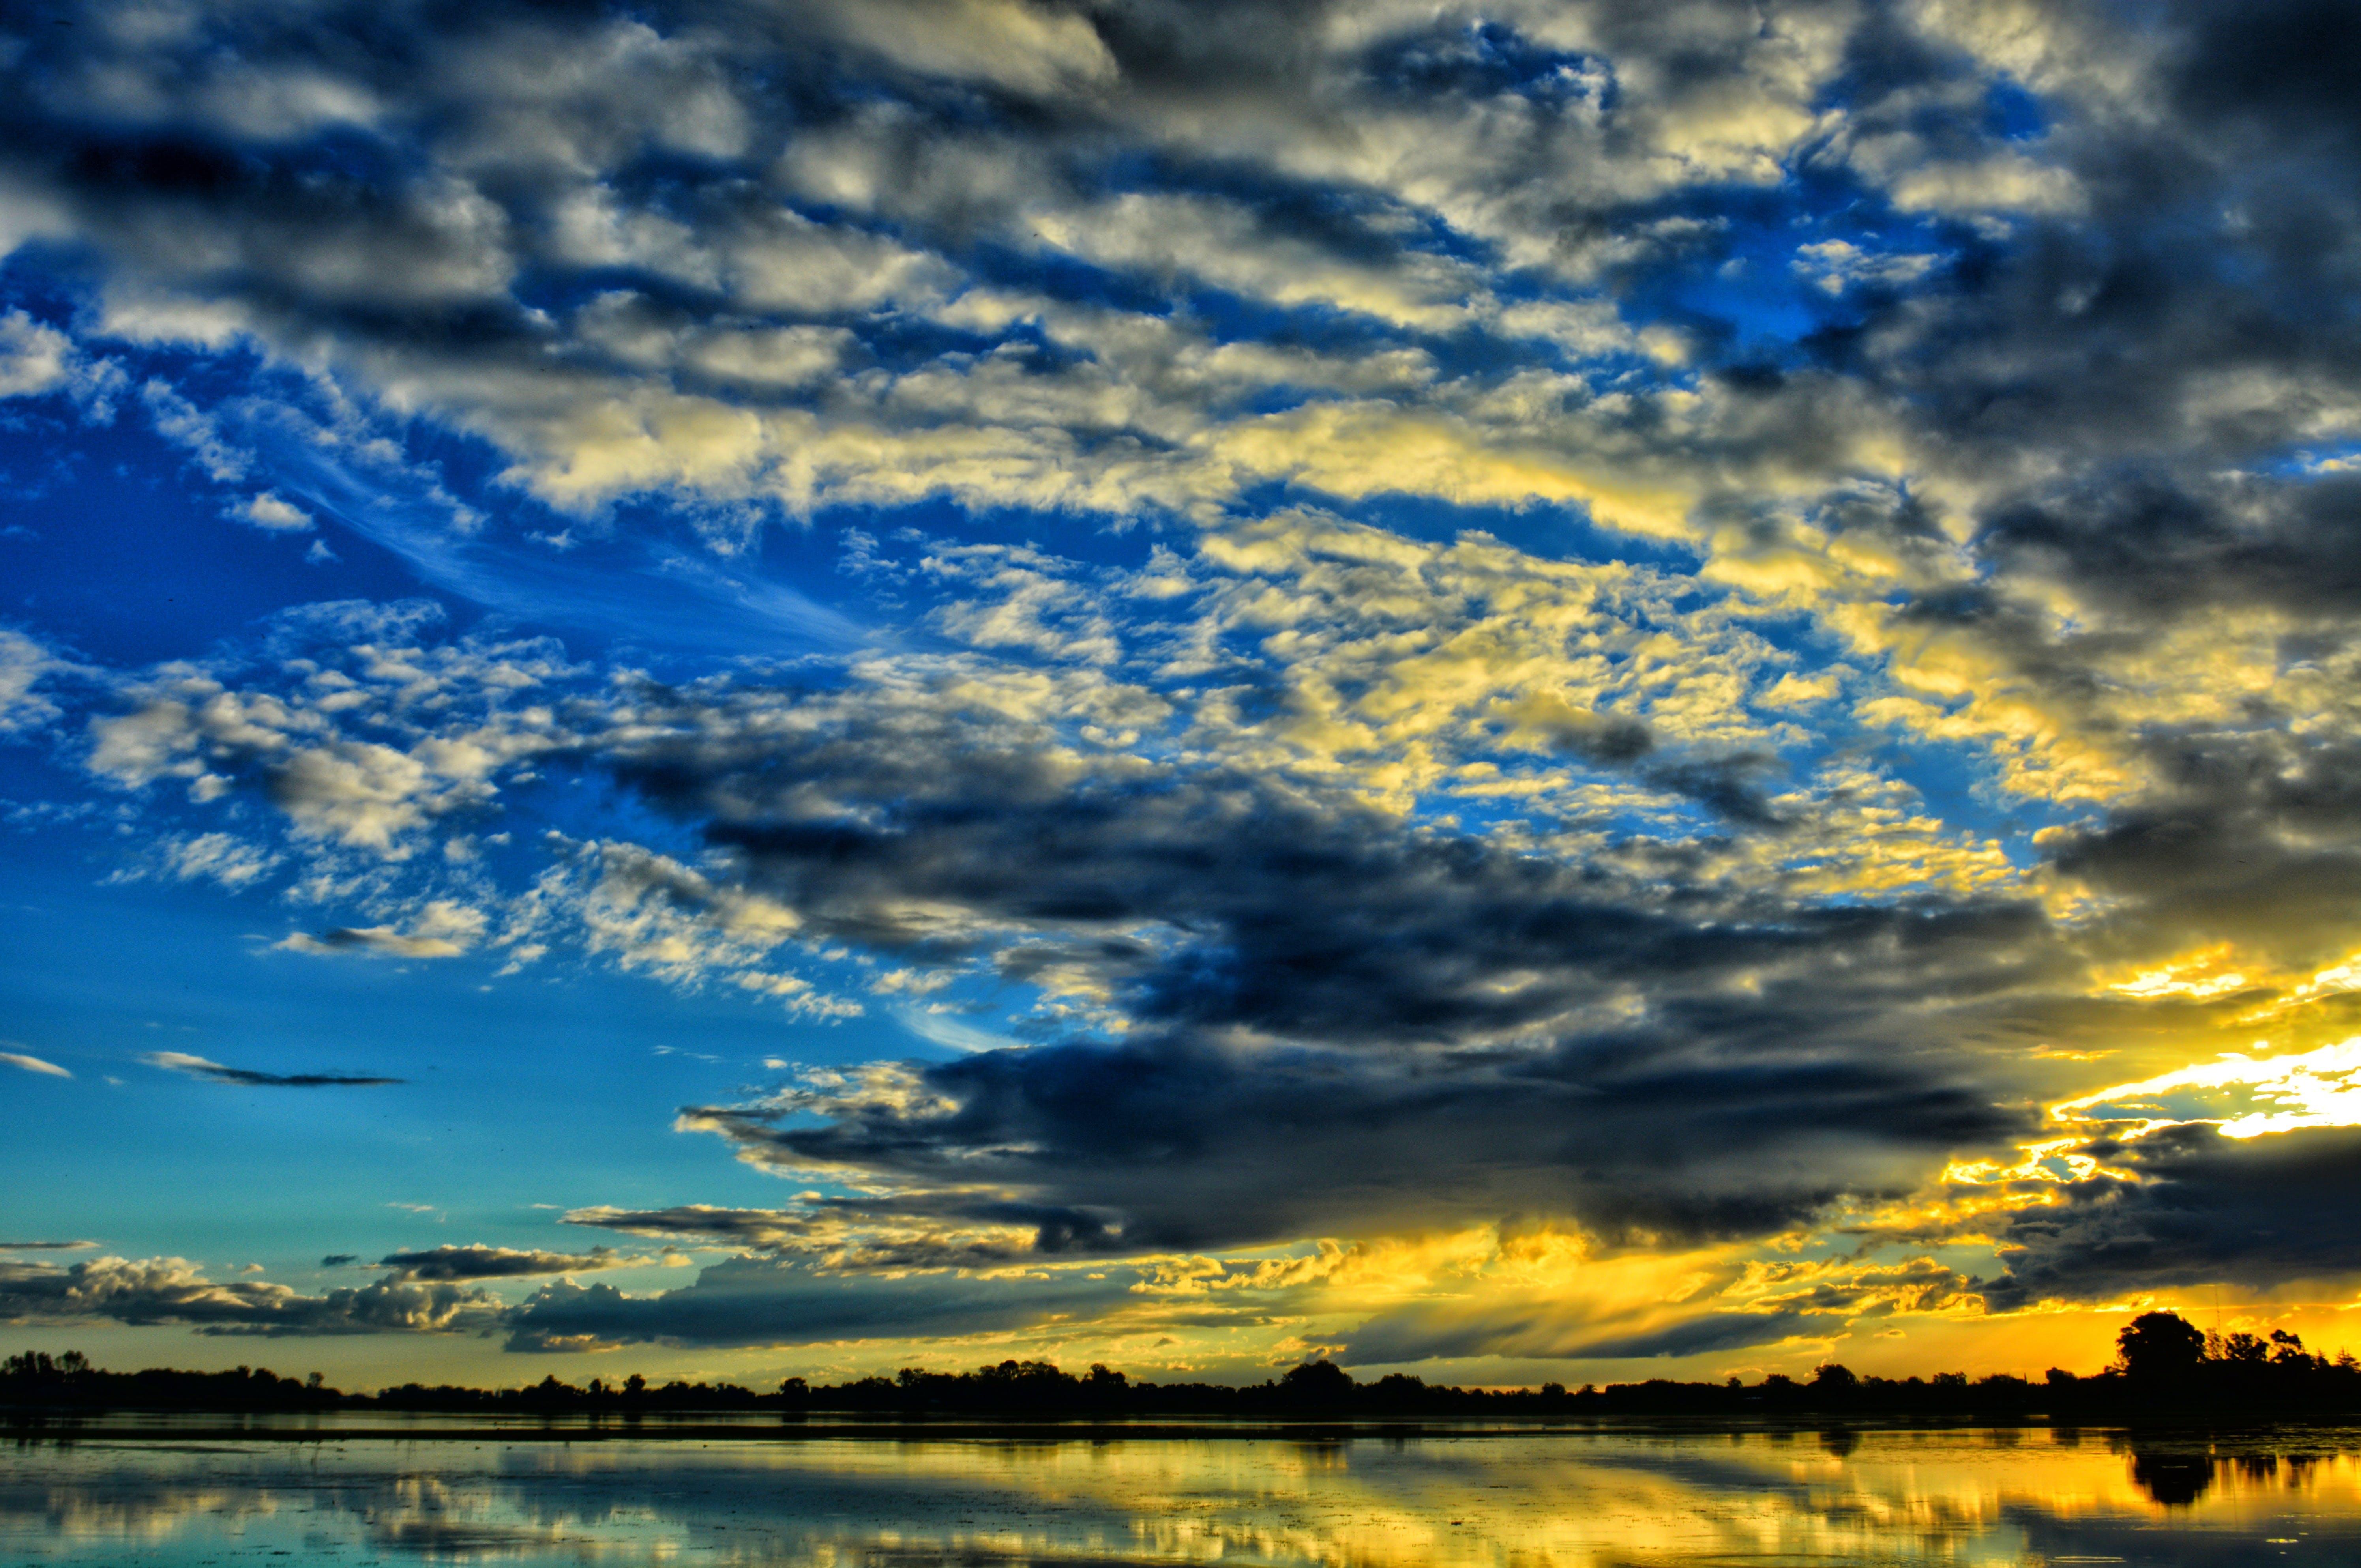 clouds, dramatic, dusk